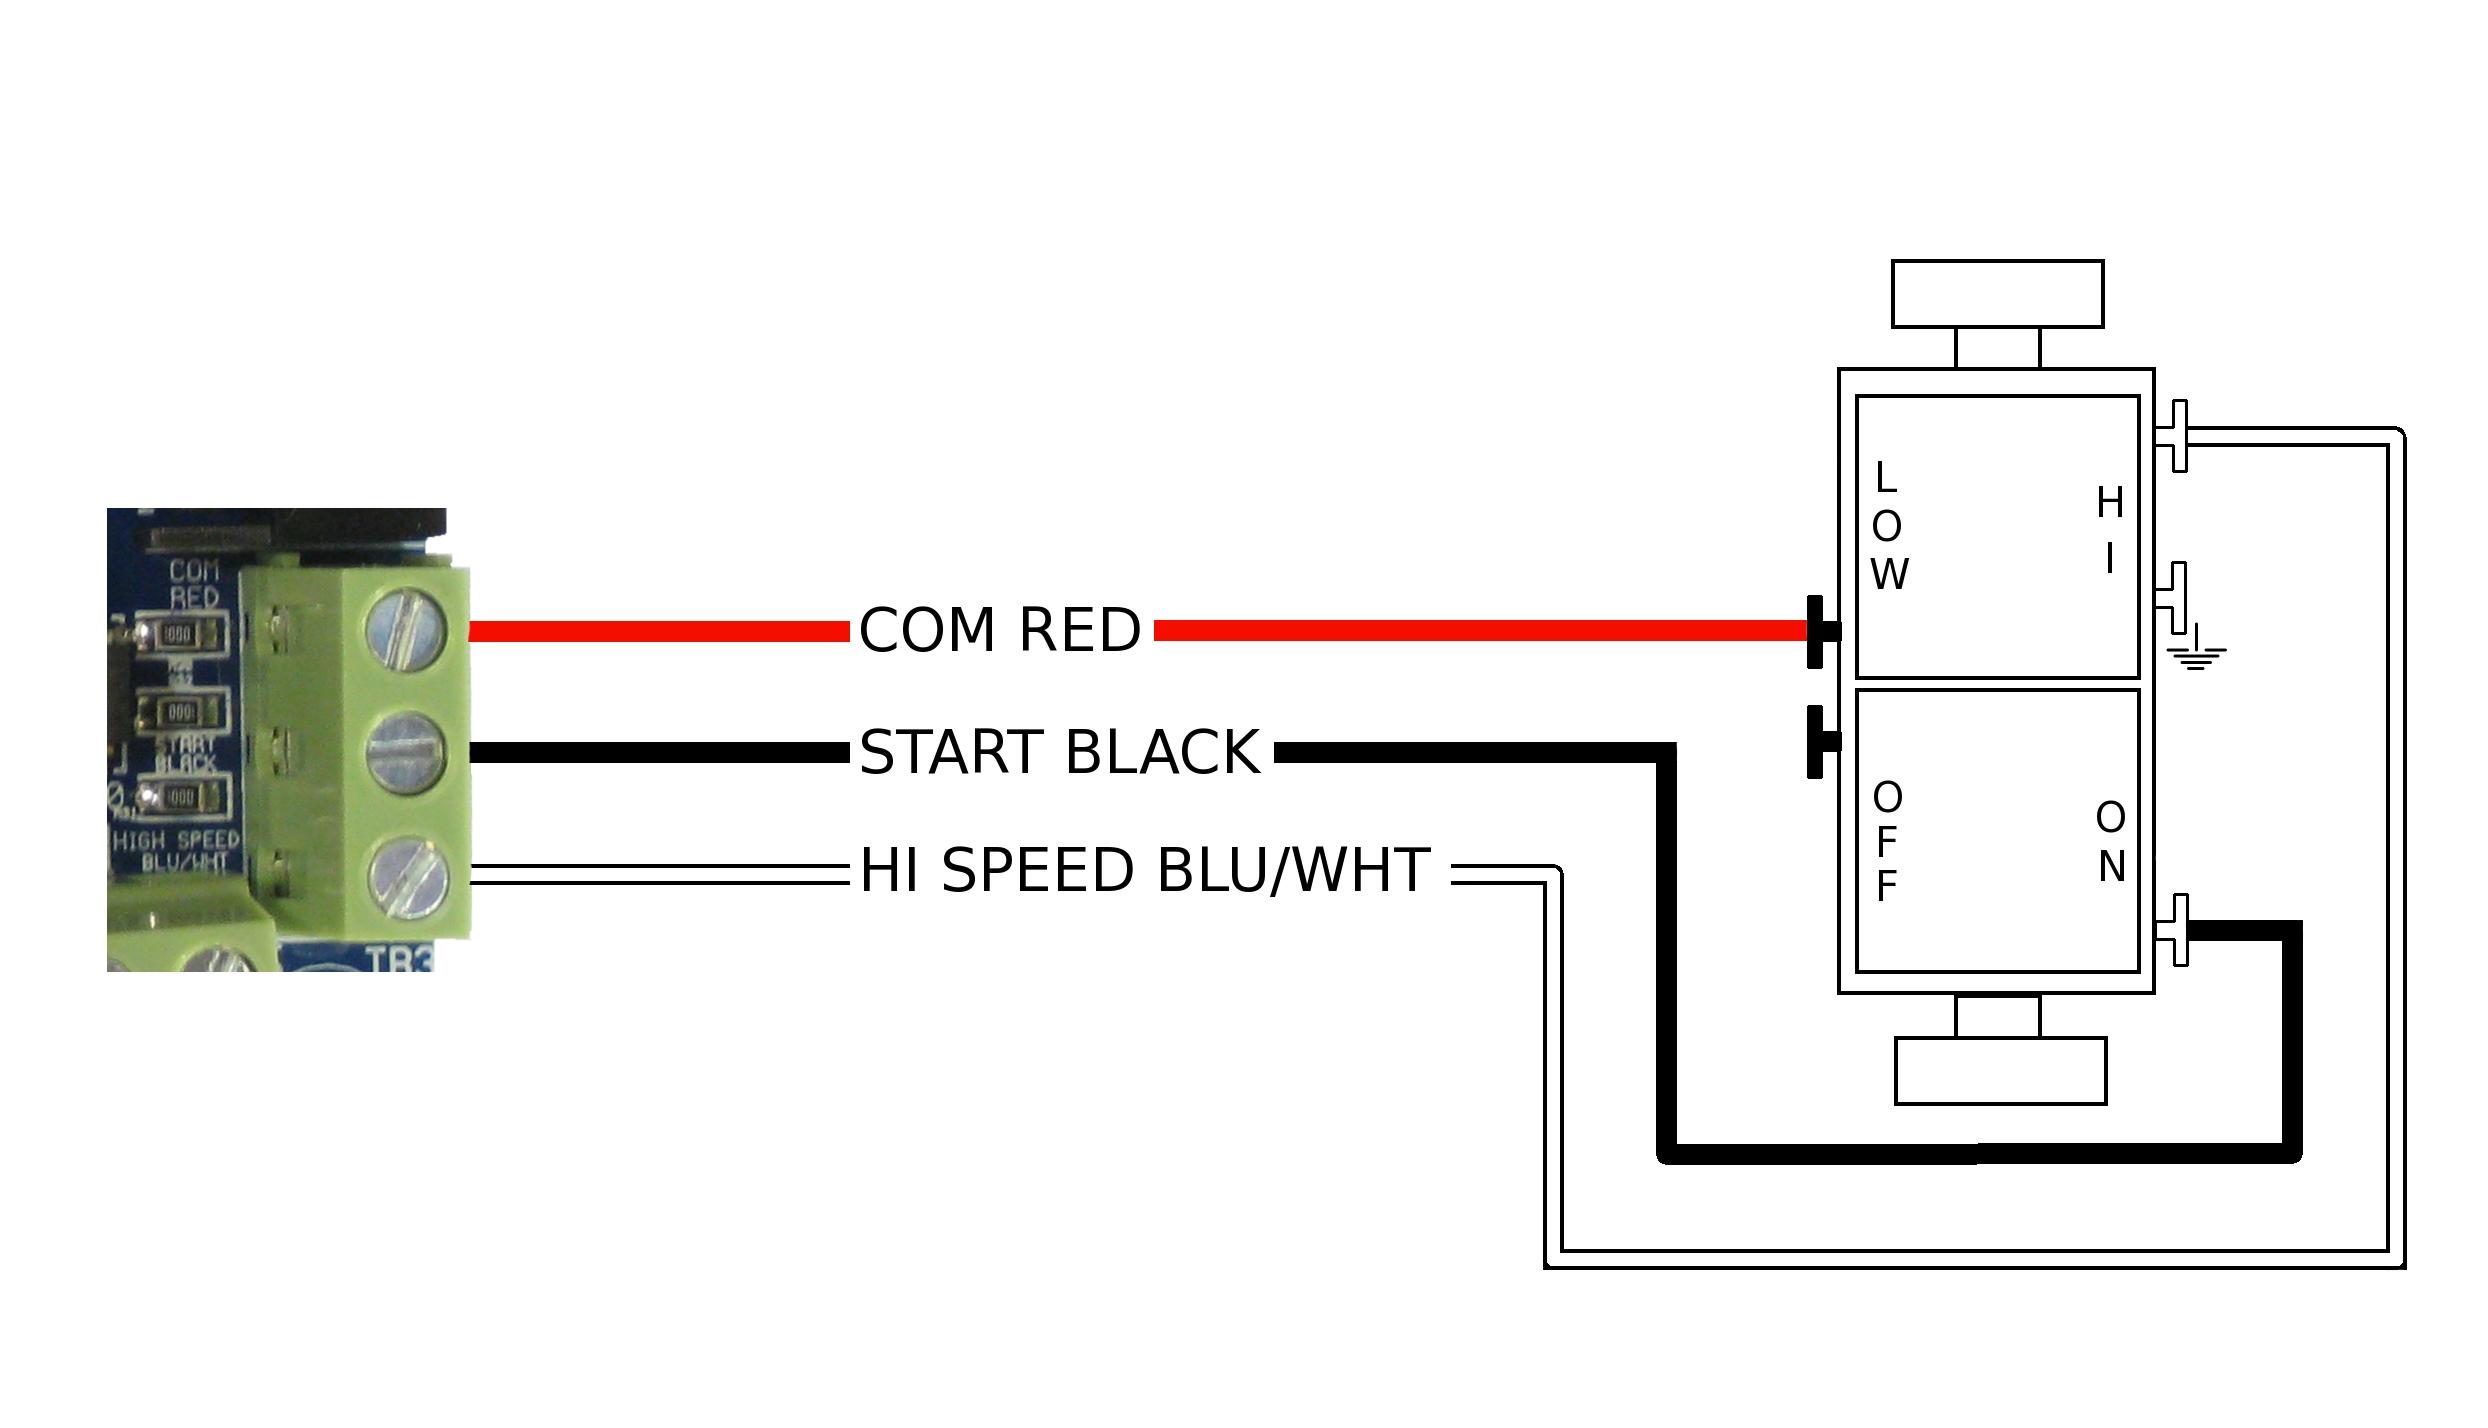 Attic Fan Switch Wiring Diagram Free Download - Wiring Diagrams DataUssel